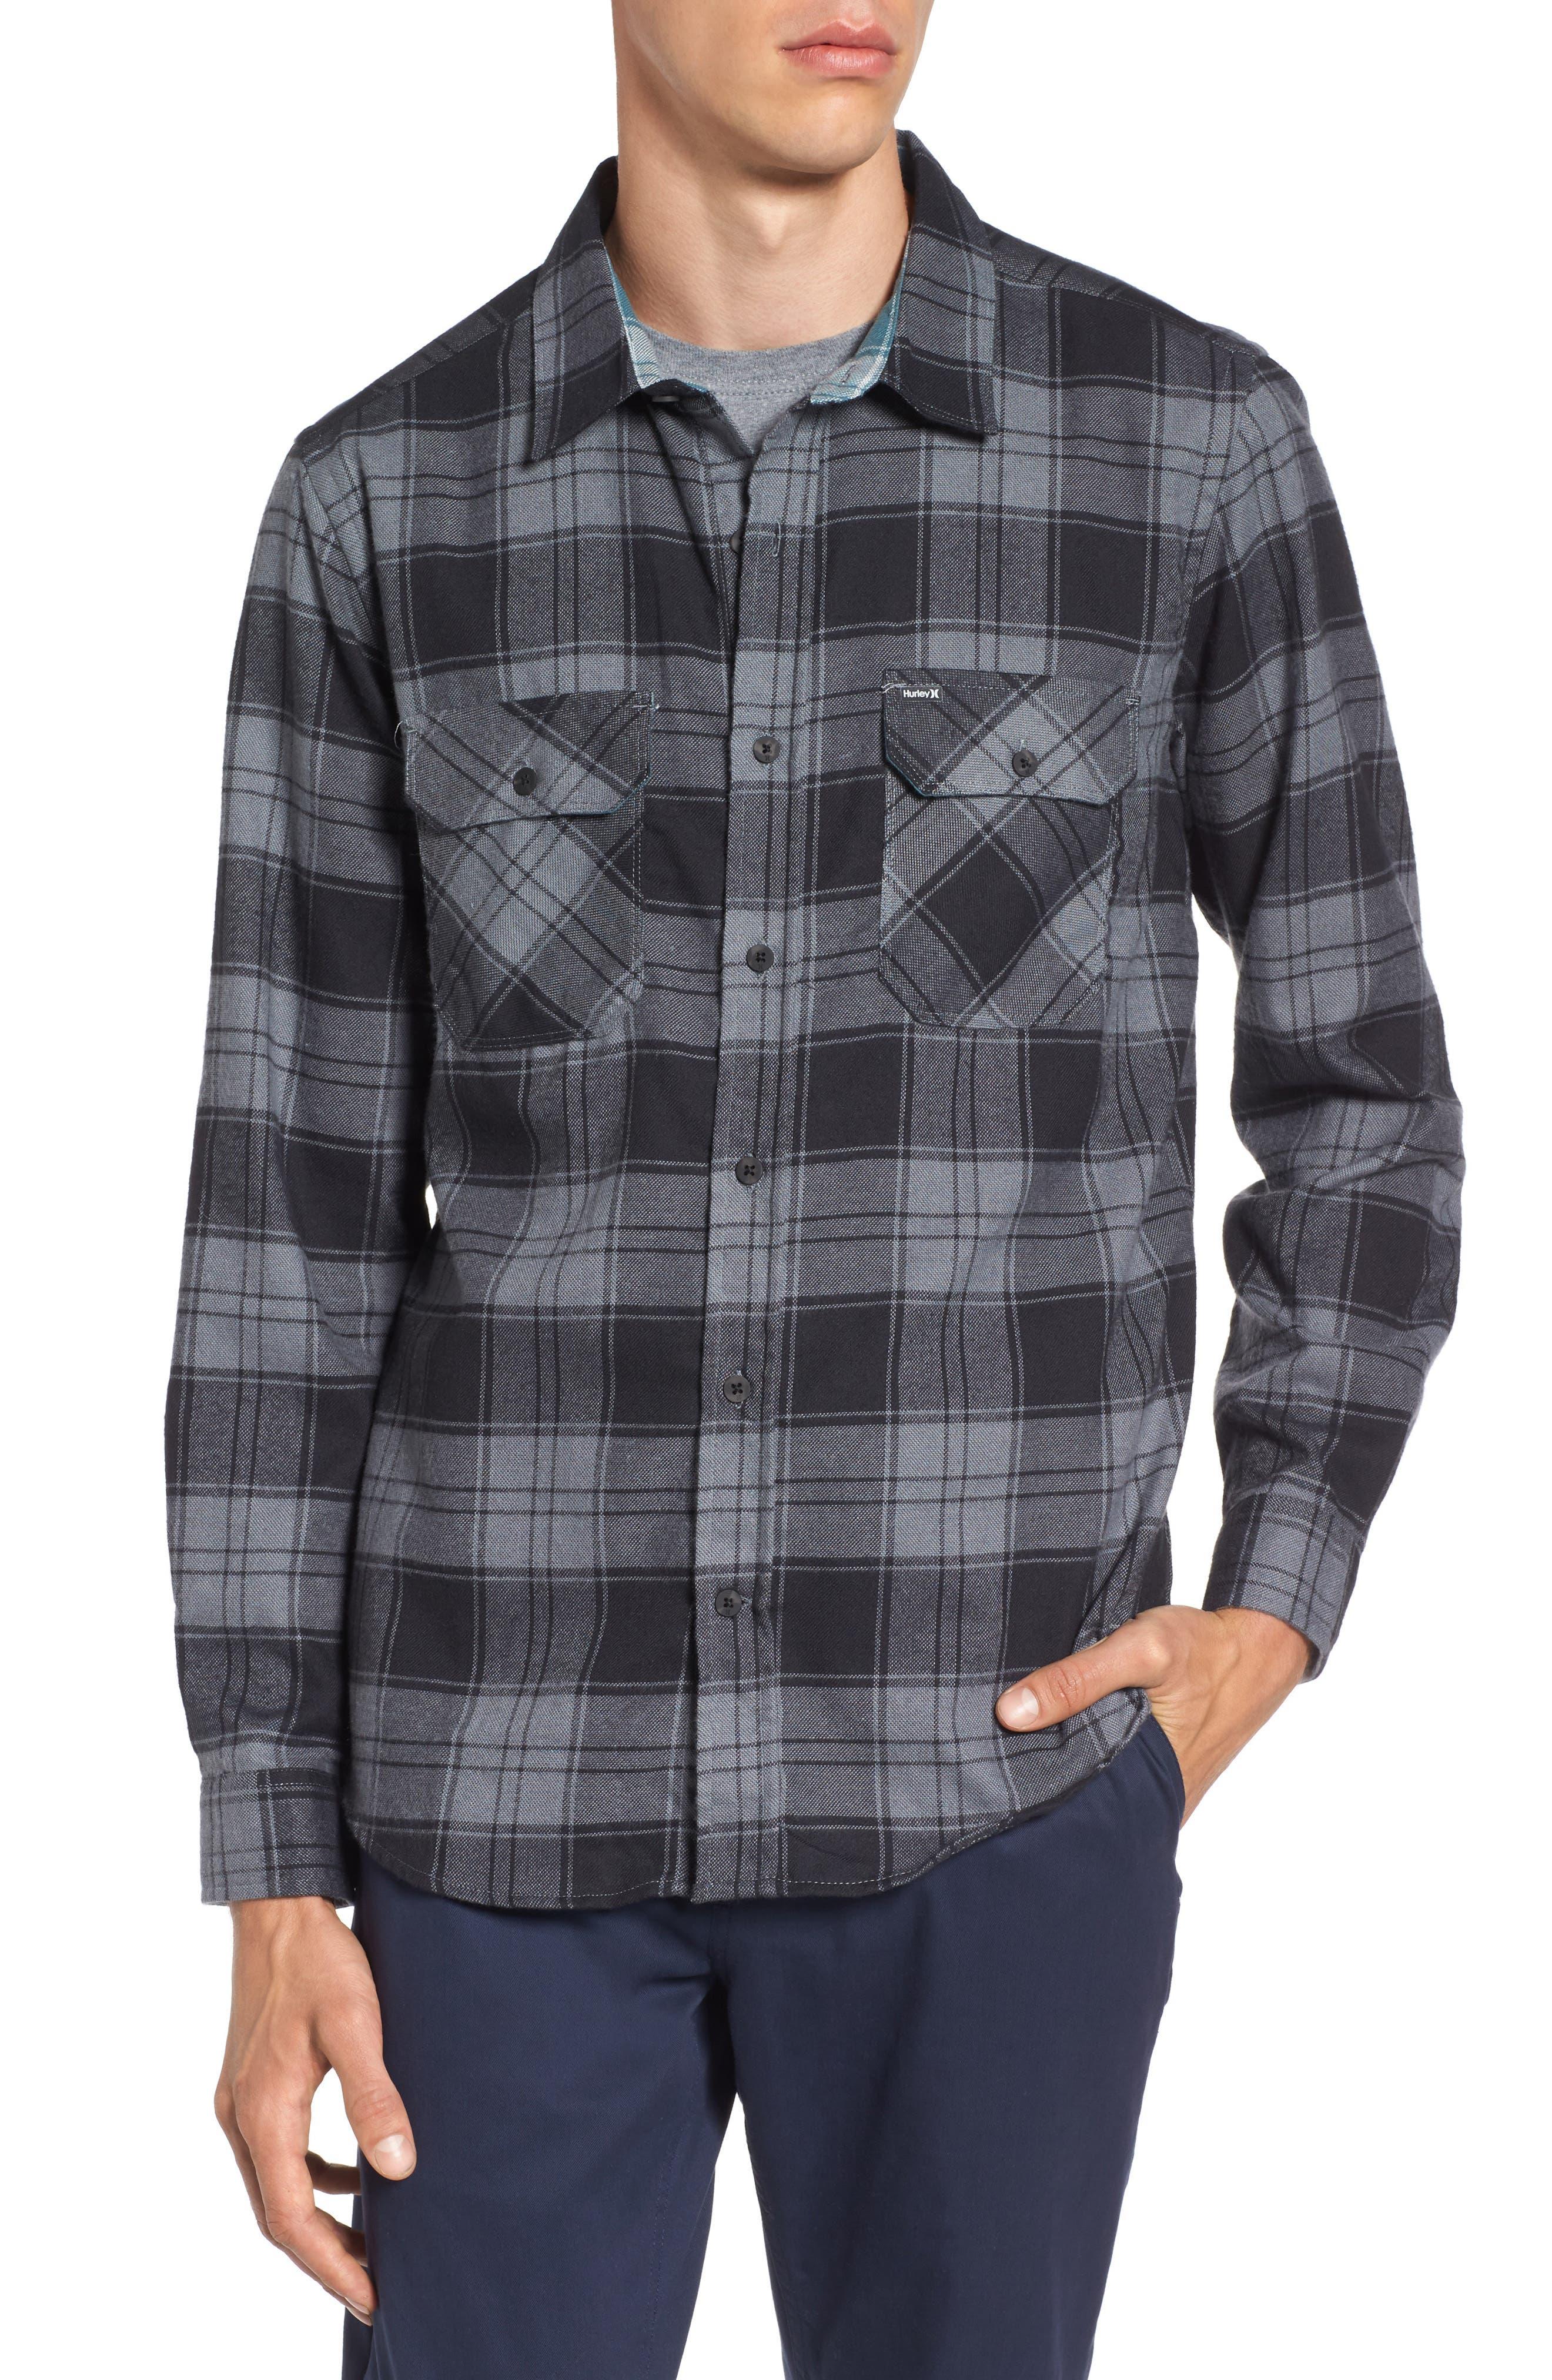 Alternate Image 1 Selected - Hurley Check Dri-FIT Shirt